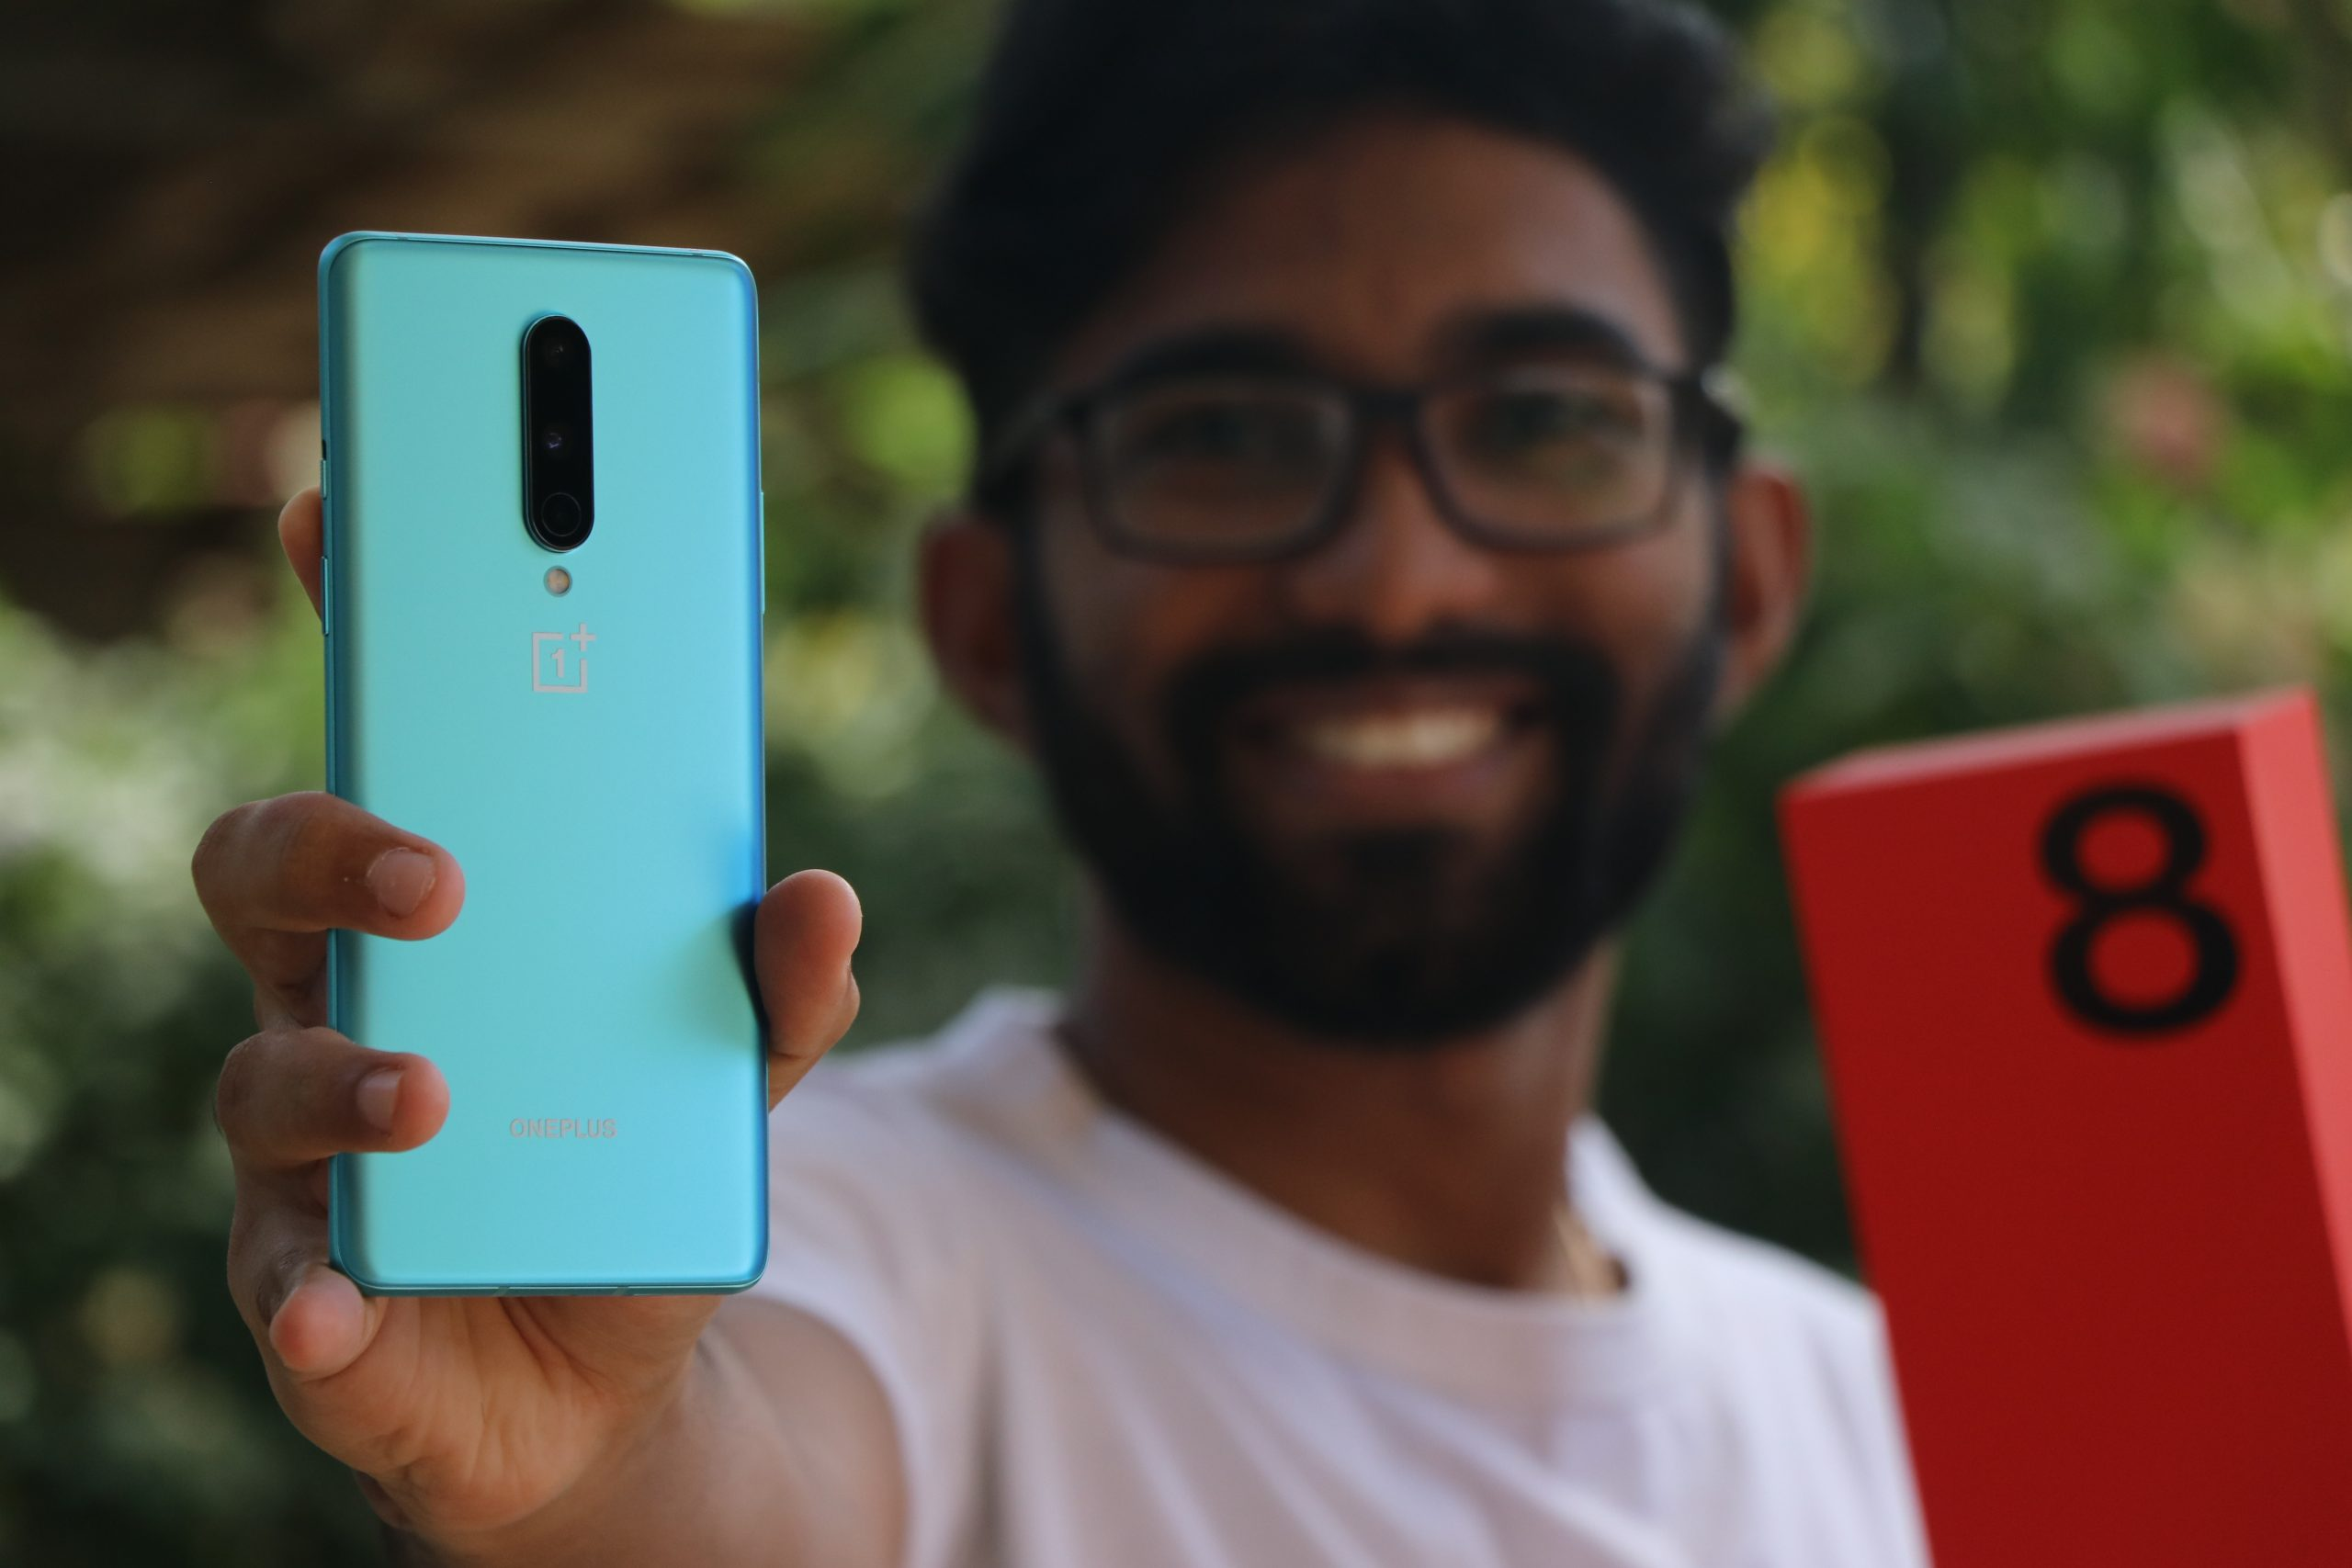 IMG 1233 scaled - OnePlus 8 Initial Impressions in Sri Lanka